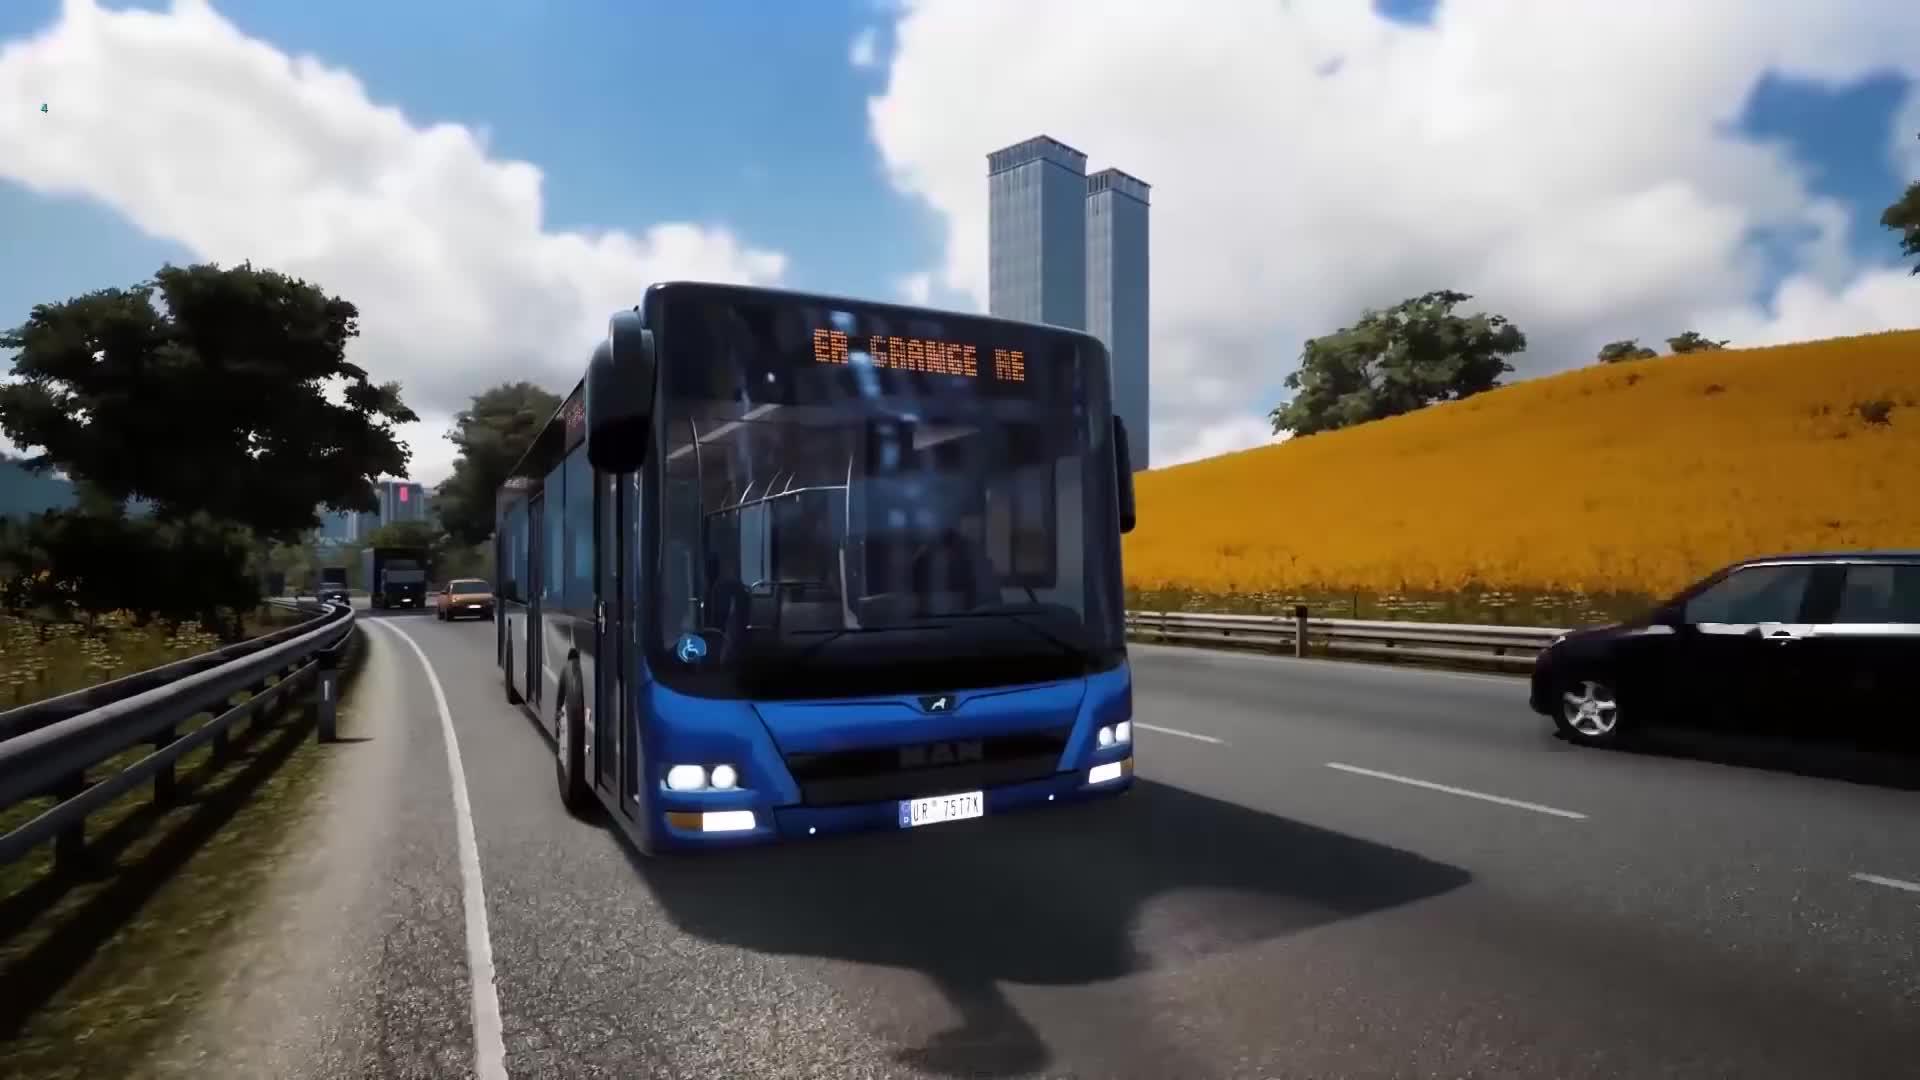 bus simulator prich dza na konzoly hern video sector. Black Bedroom Furniture Sets. Home Design Ideas